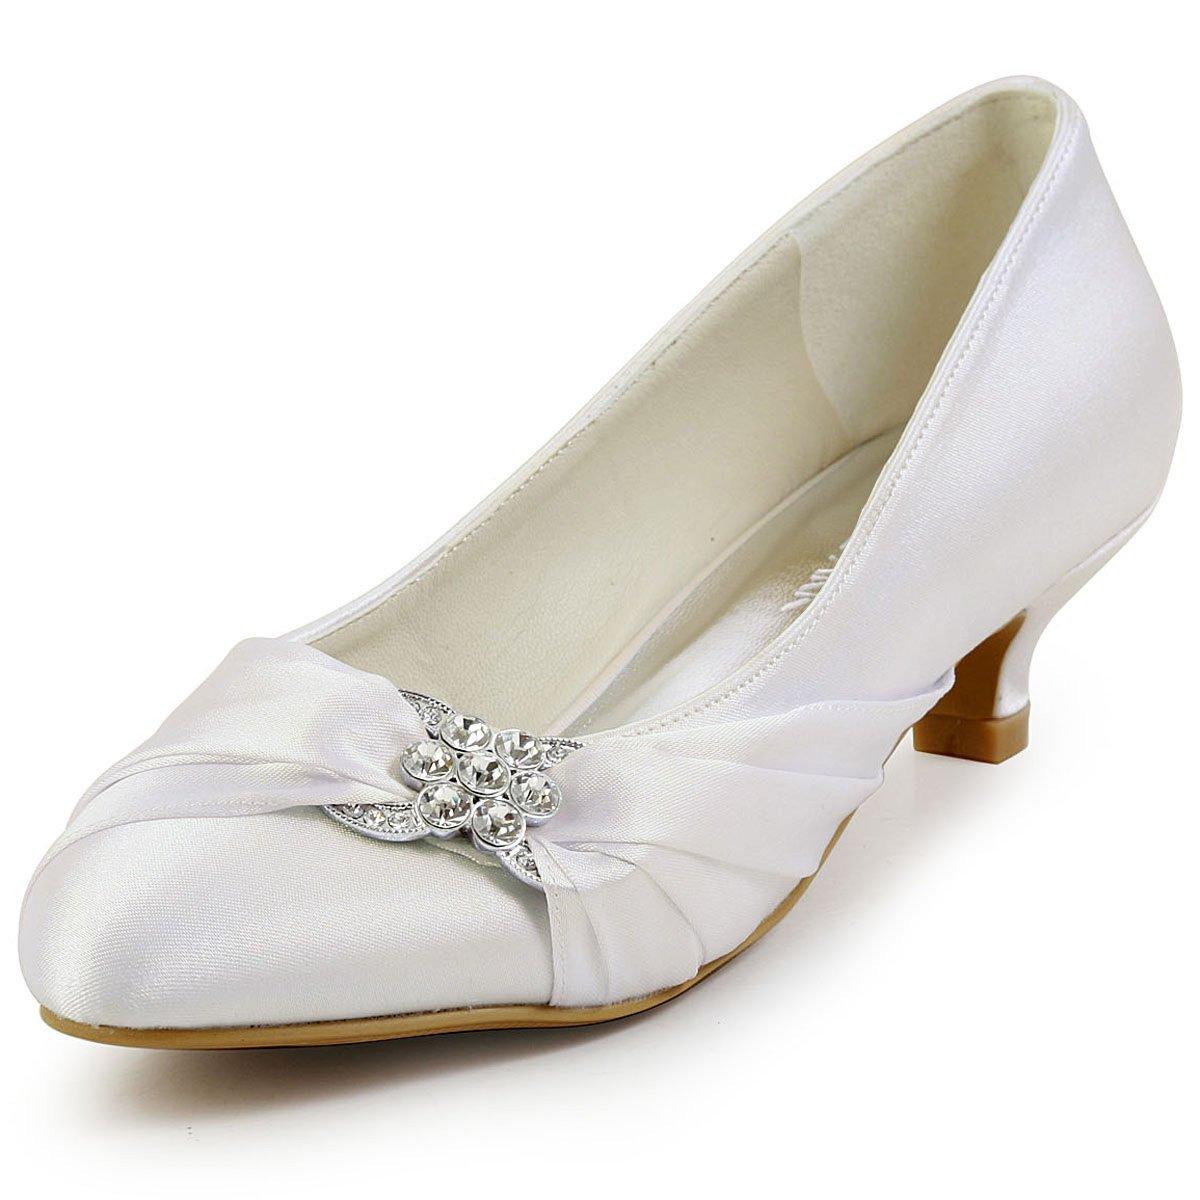 ElegantPark EP2006L Women Comfort Heel Closed Toe Rhinestone Satin Bridal Wedding Shoes Ivory US 8.5